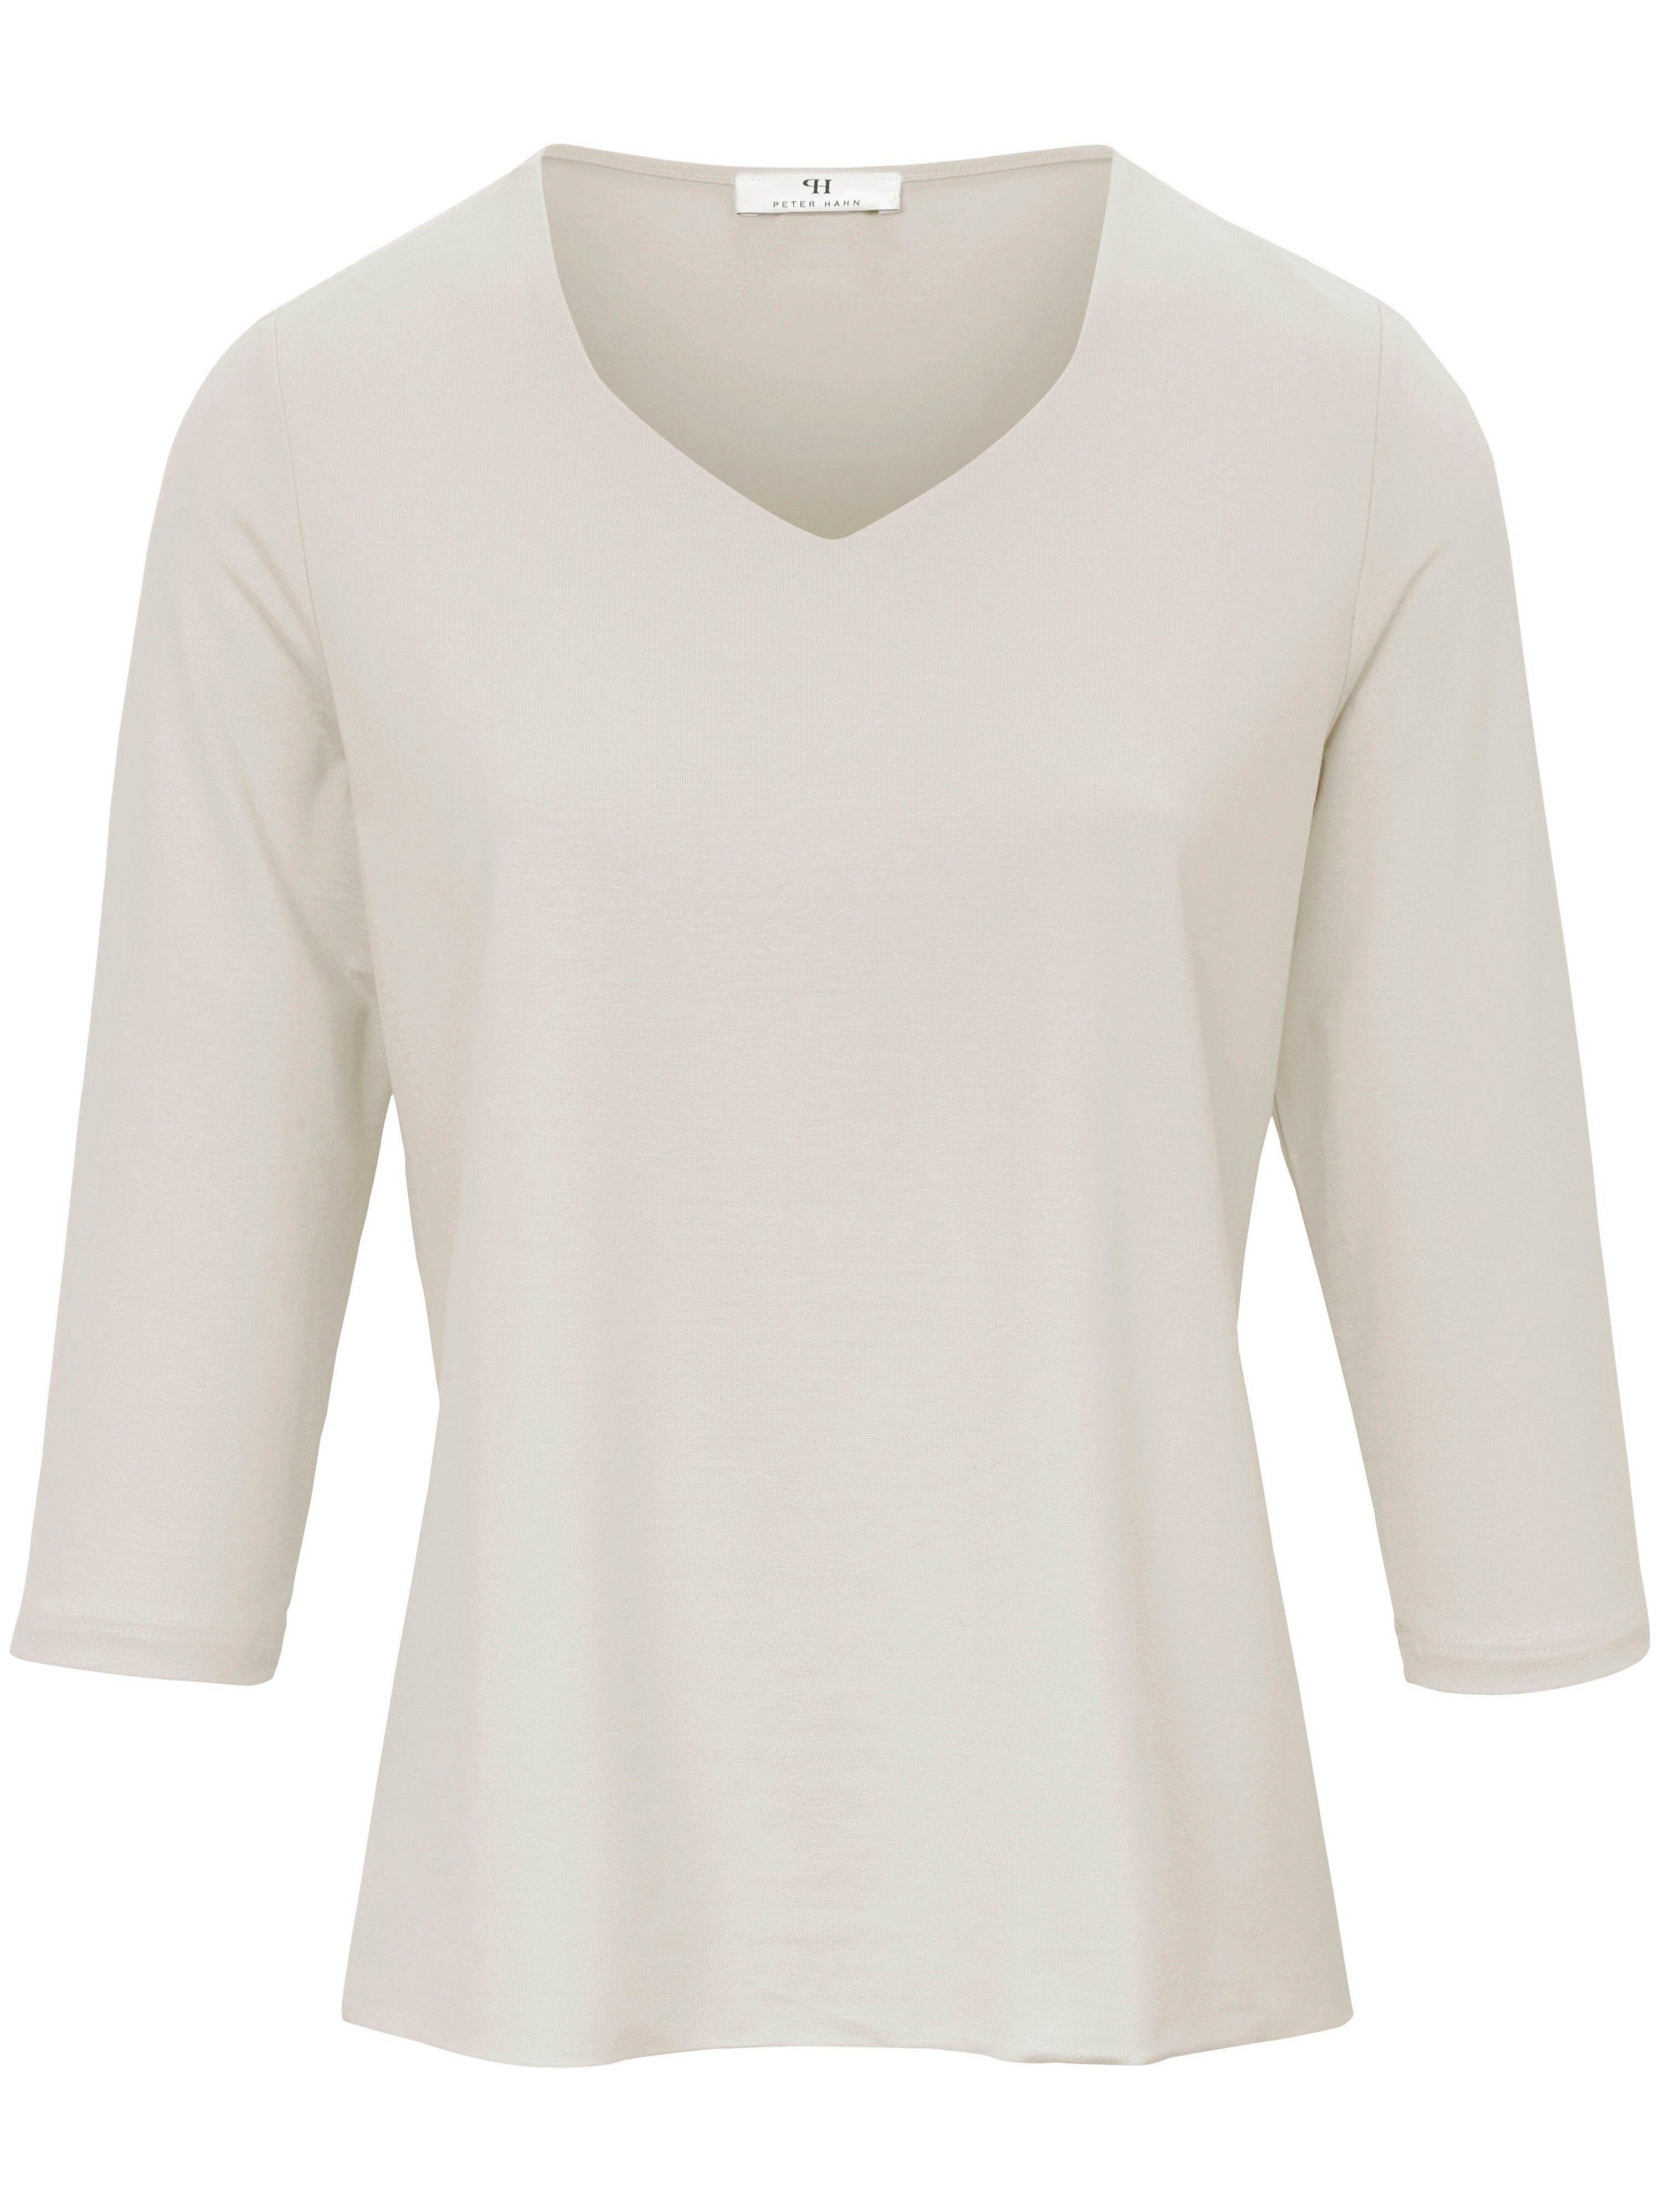 Peter Hahn Le T-shirt manches 3/4  Peter Hahn beige  - Femme - 38